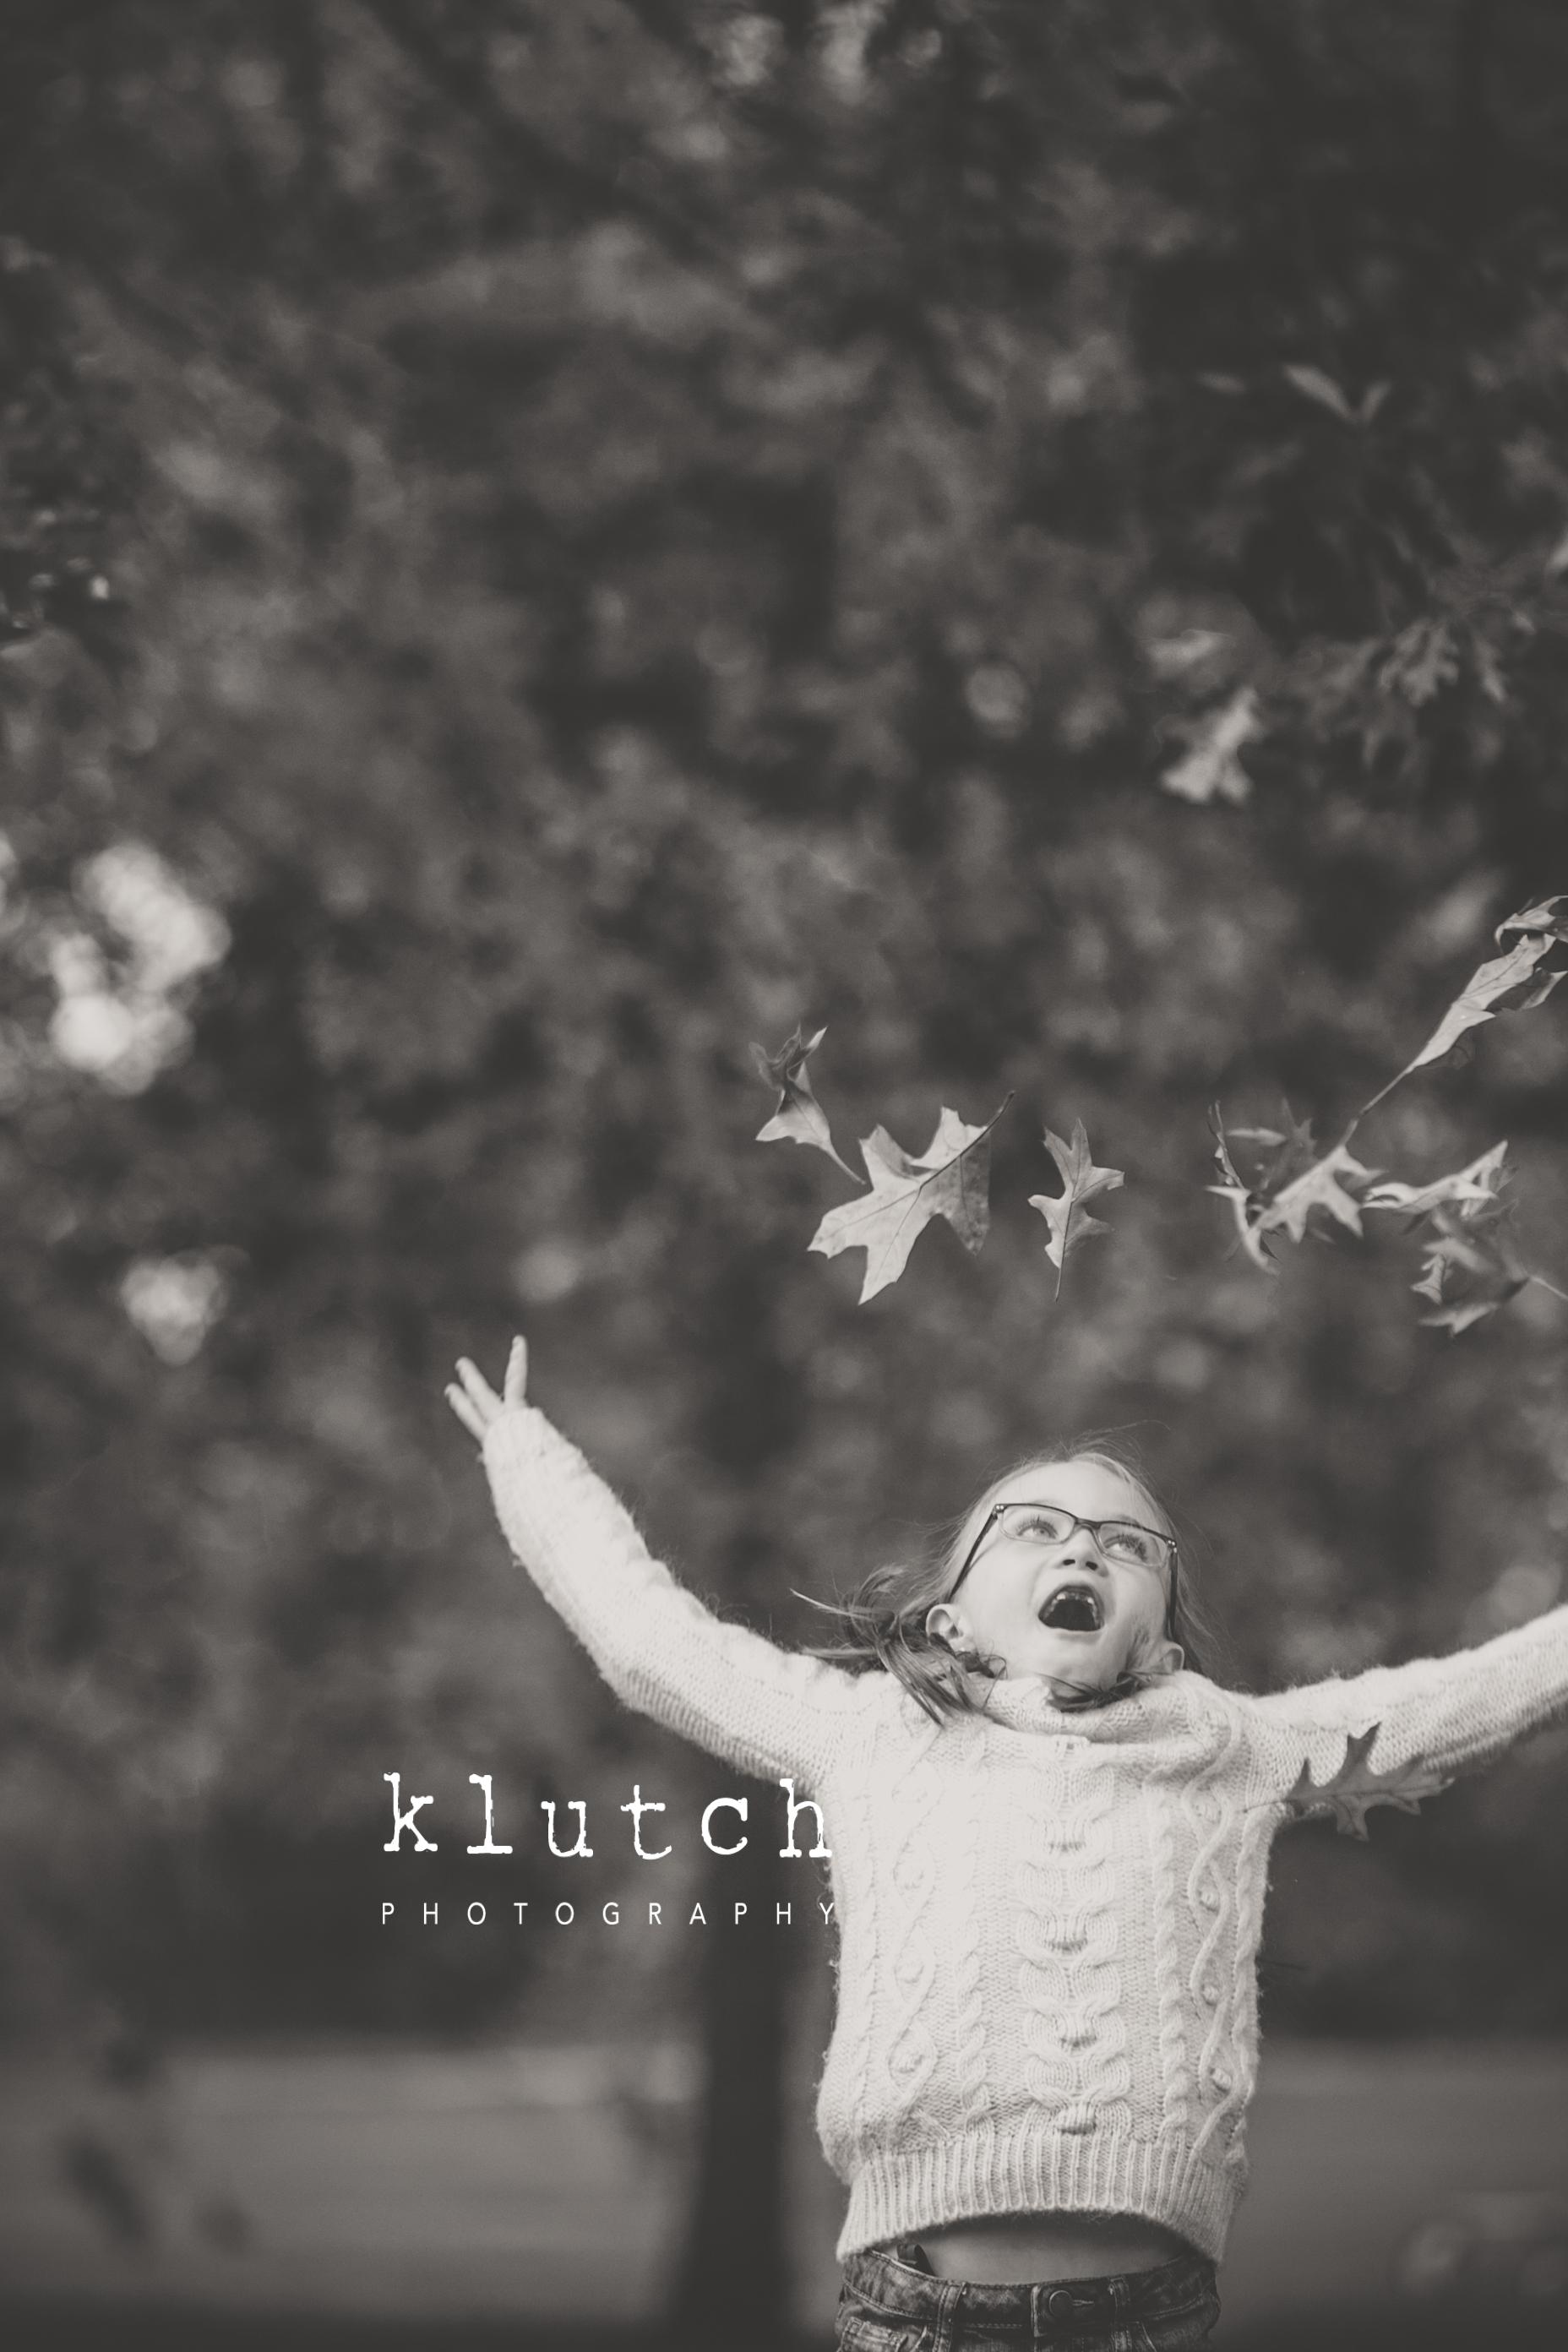 Klutch Photography,white rock family photographer, vancouver family photographer, whiterock lifestyle photographer, life unscripted photographer, life unscripted session, photography,Dina Ferreira Stoddard-1162.jpg